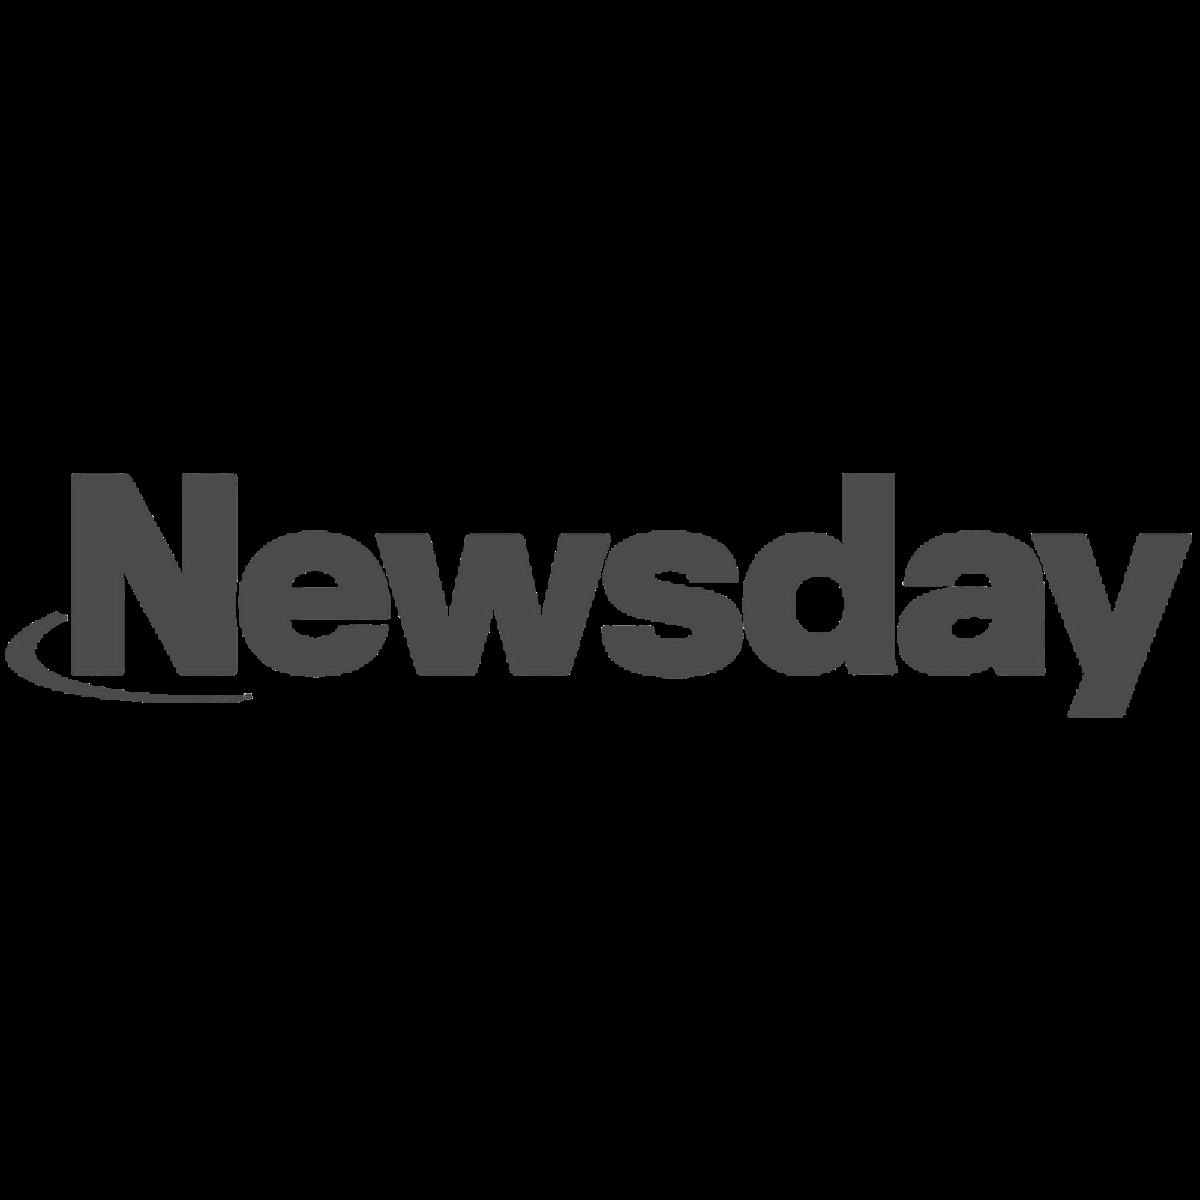 Newsday Campus Protein